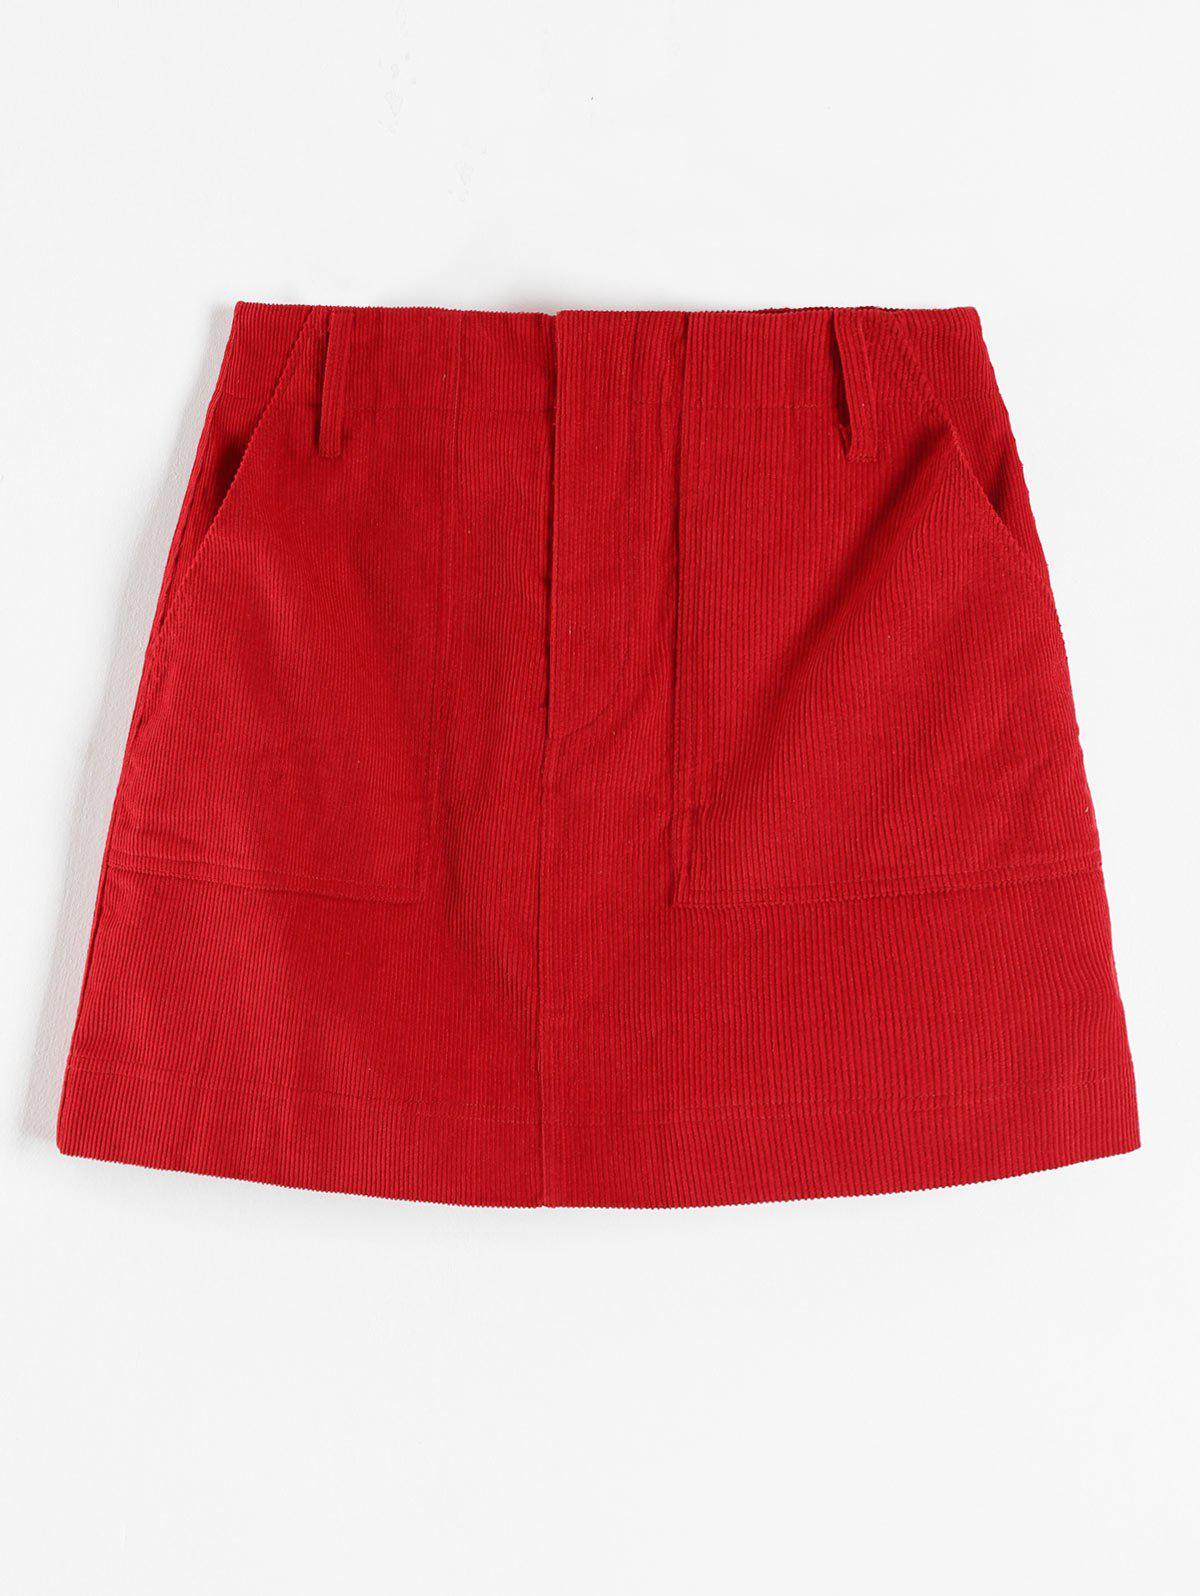 ZAFUL Corduroy Pocket Short Skirt, Red